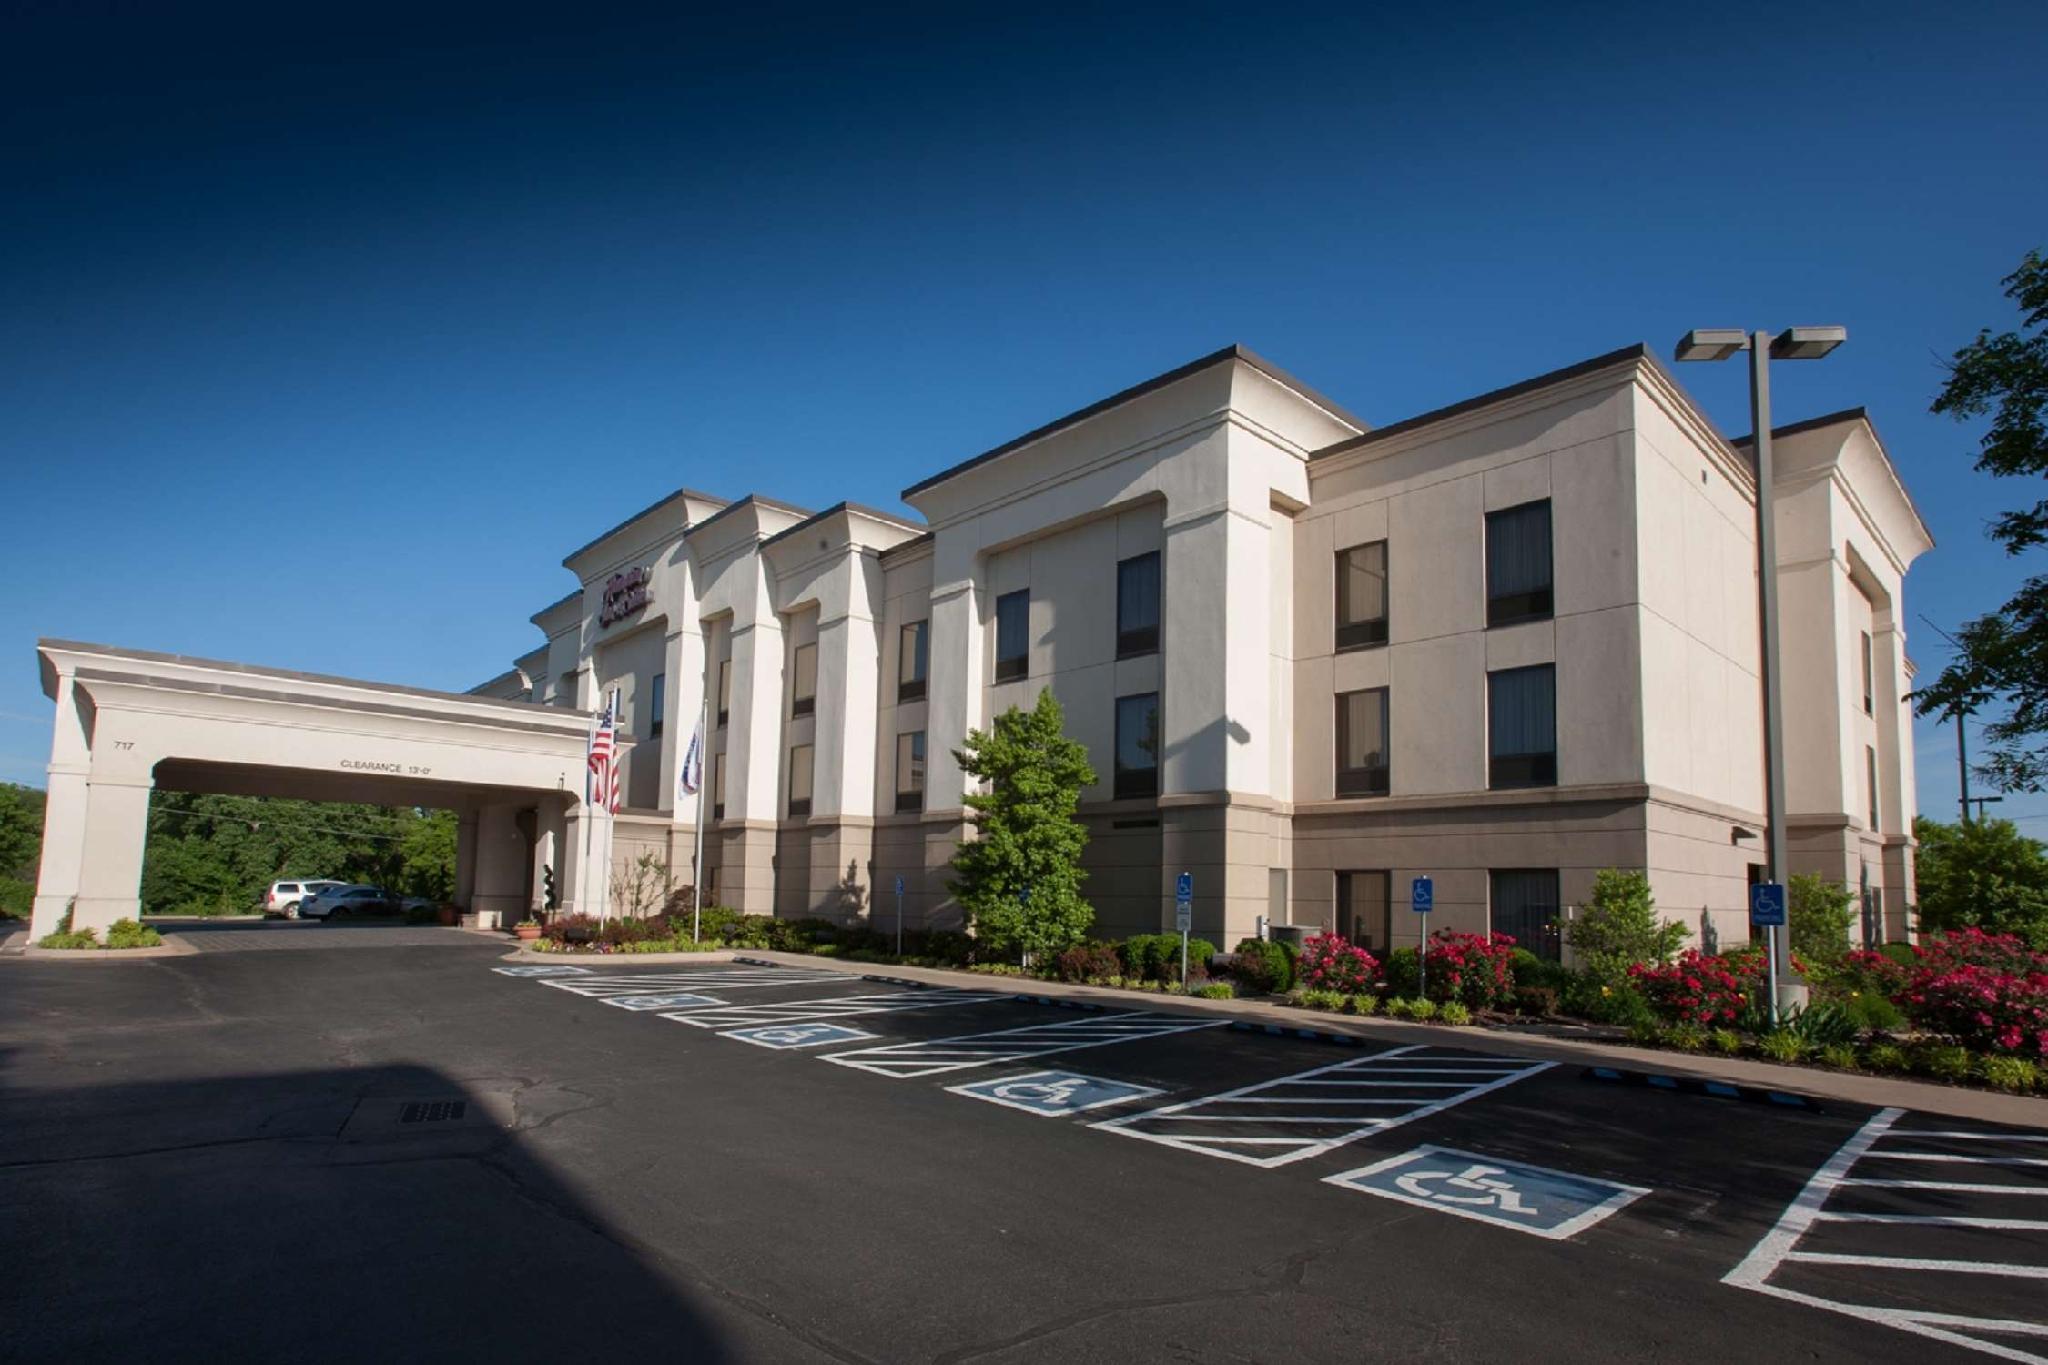 Hampton Inn And Suites Stillwater